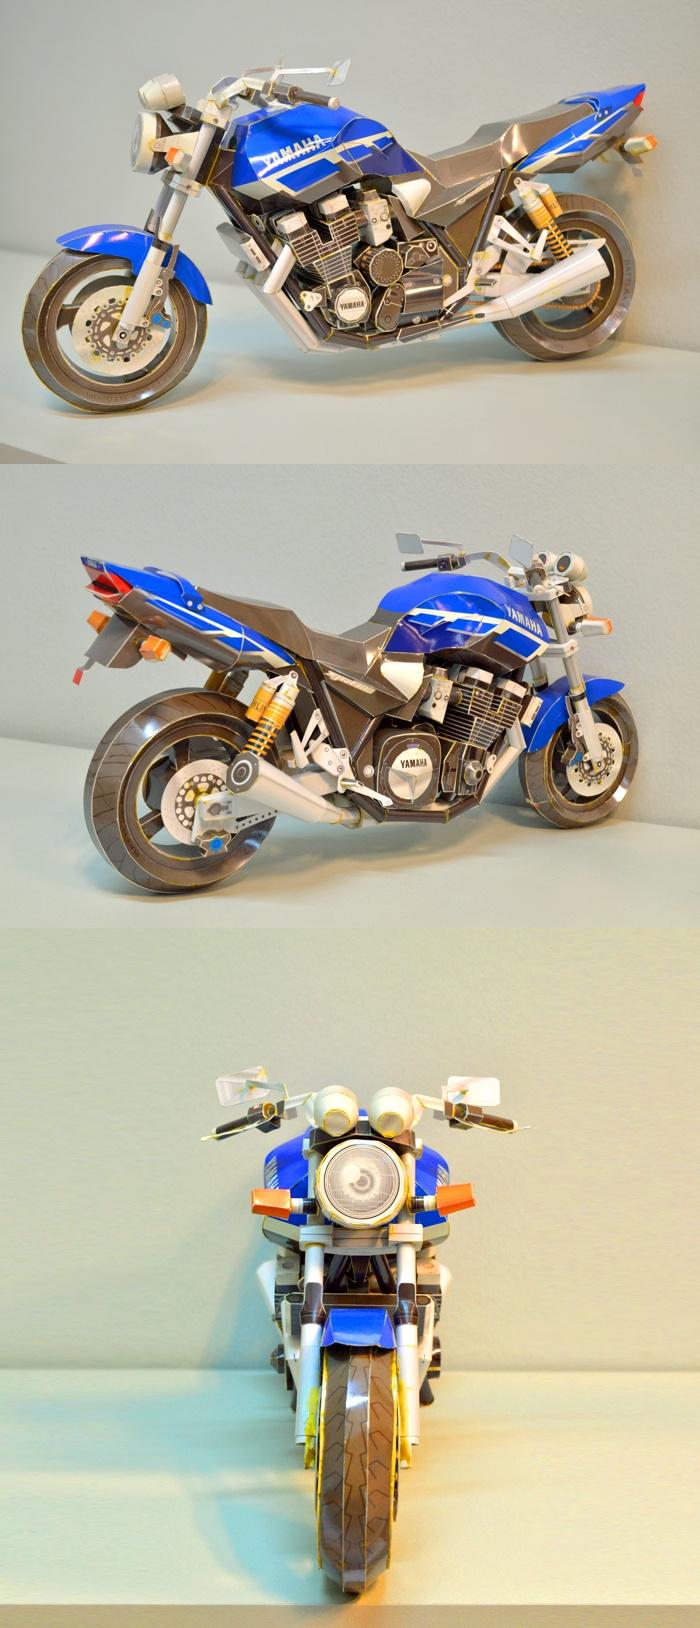 32 best motoren images on pinterest motorcycles biking and cafe yamaha xjr1300 made in paper jeuxipadfo Choice Image